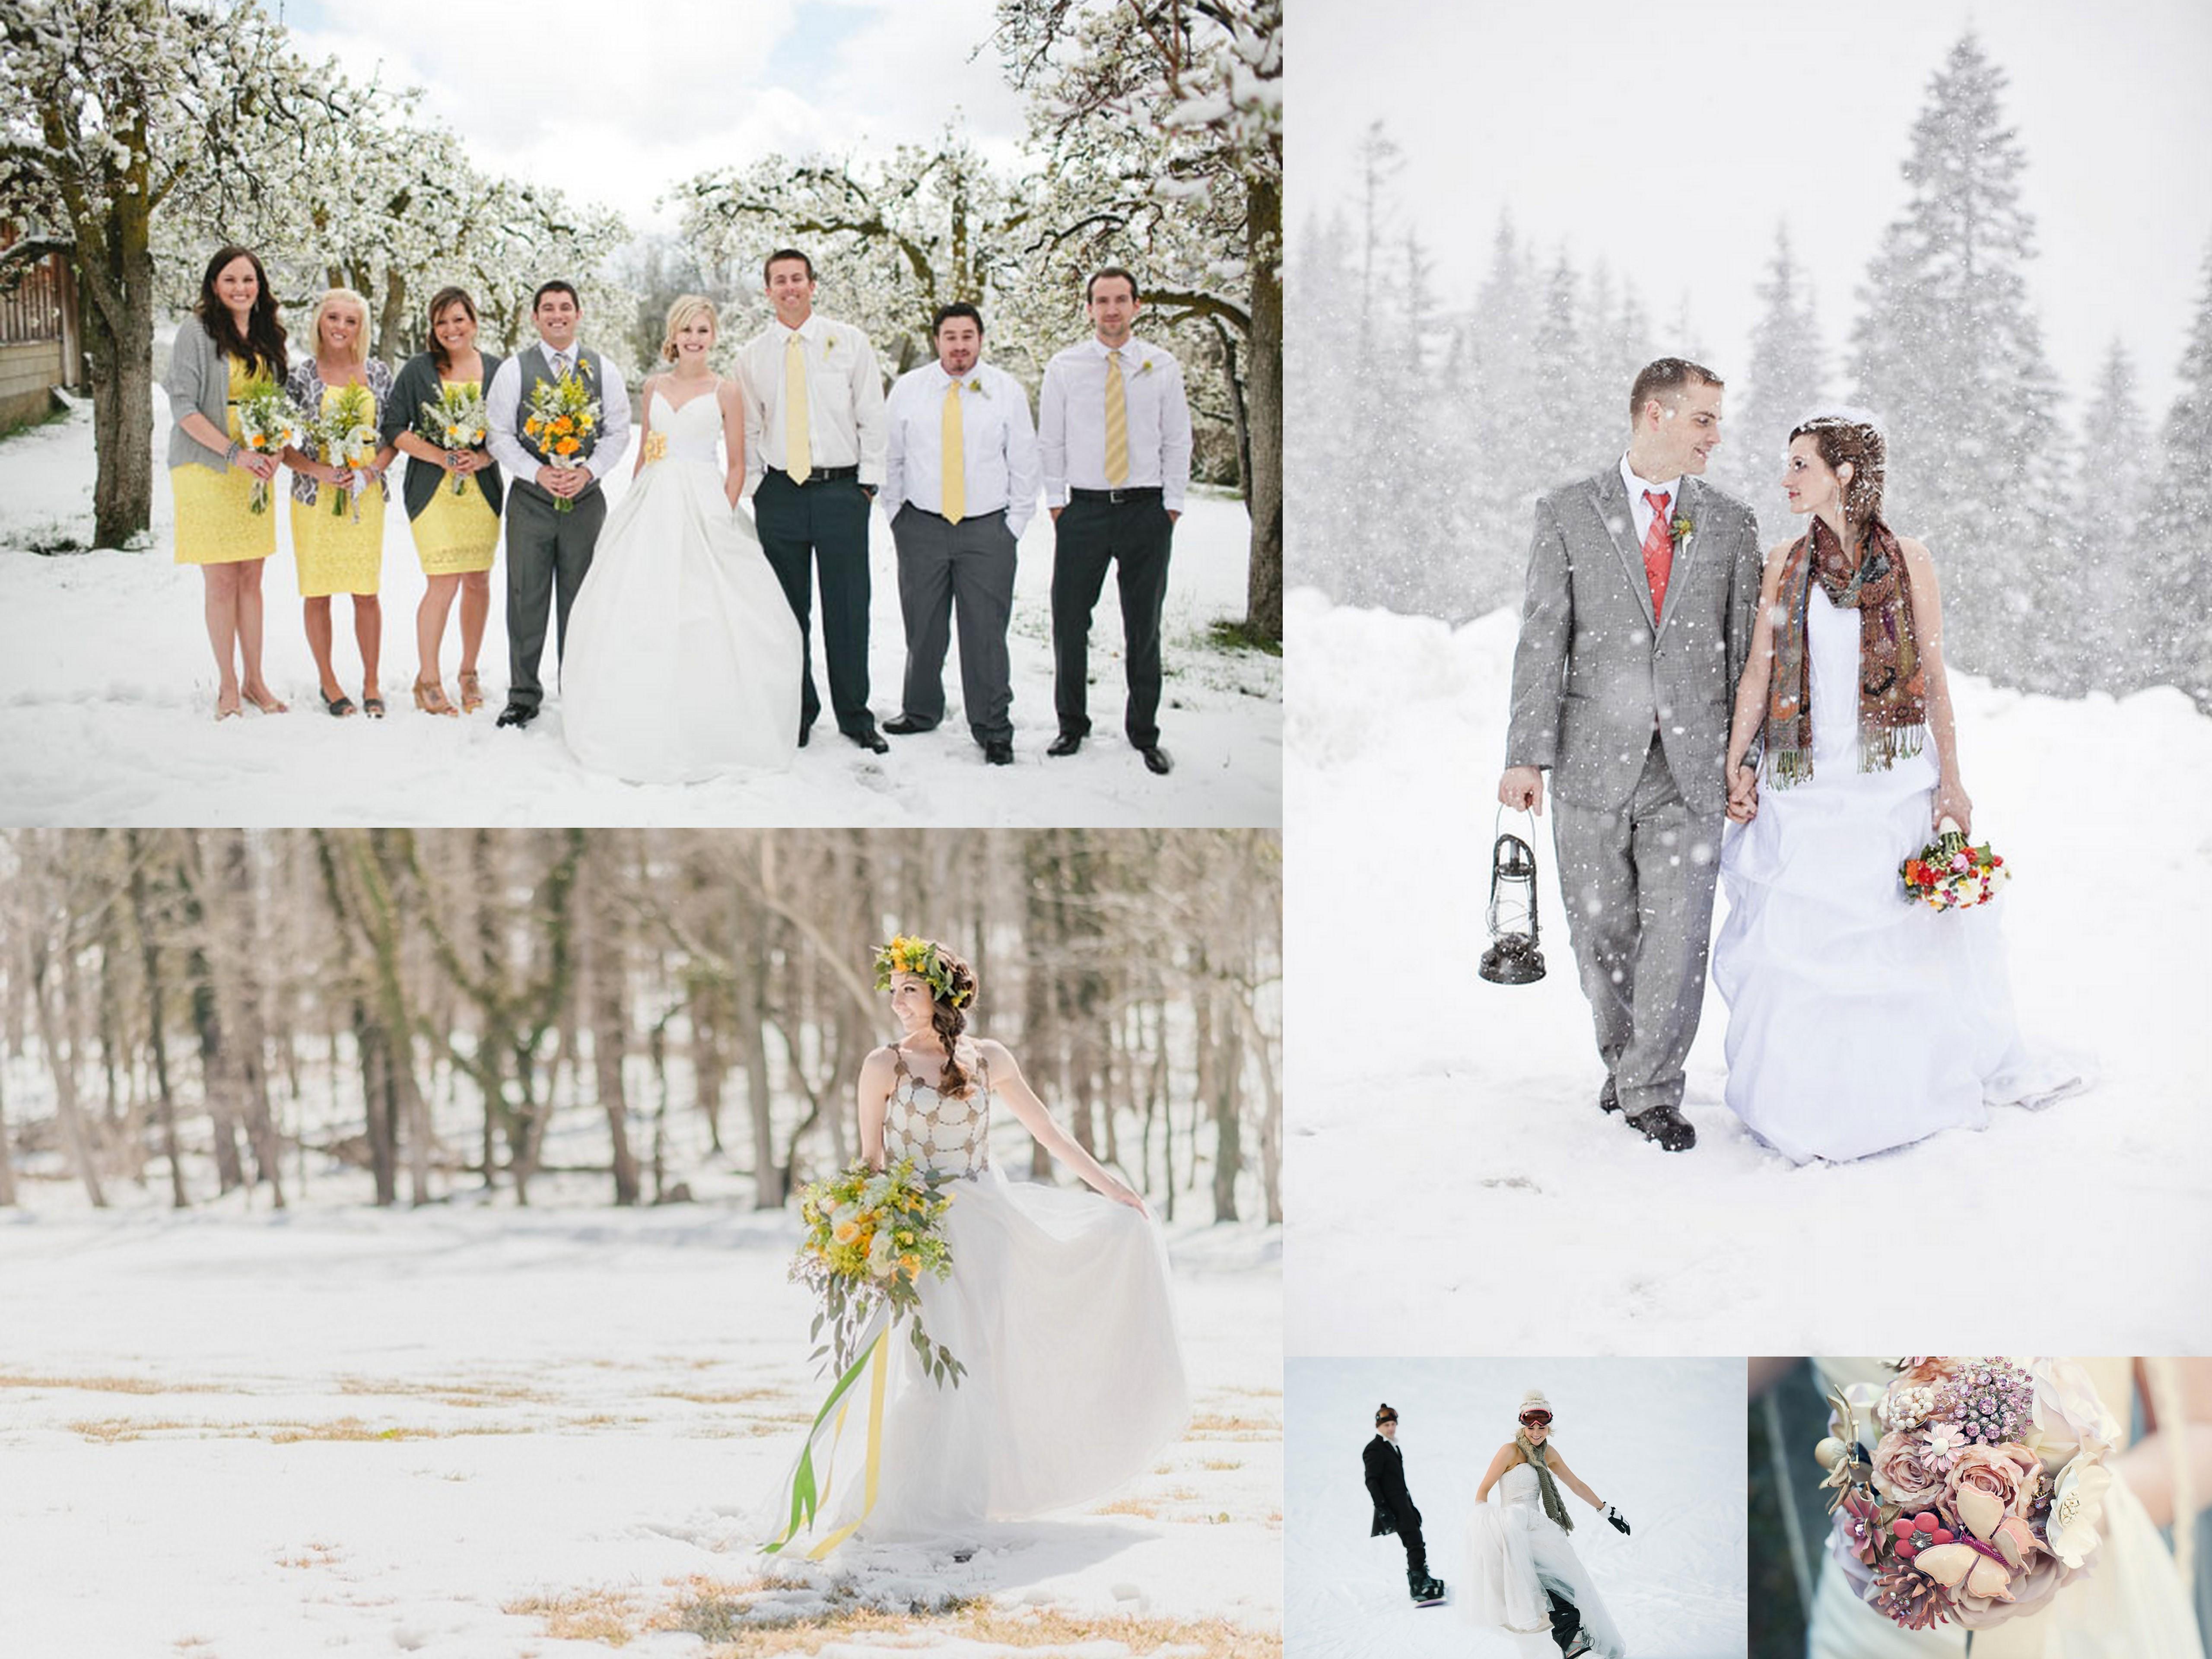 Citrus and Snow Weddings | Wedding Cards | A2zWeddingCards